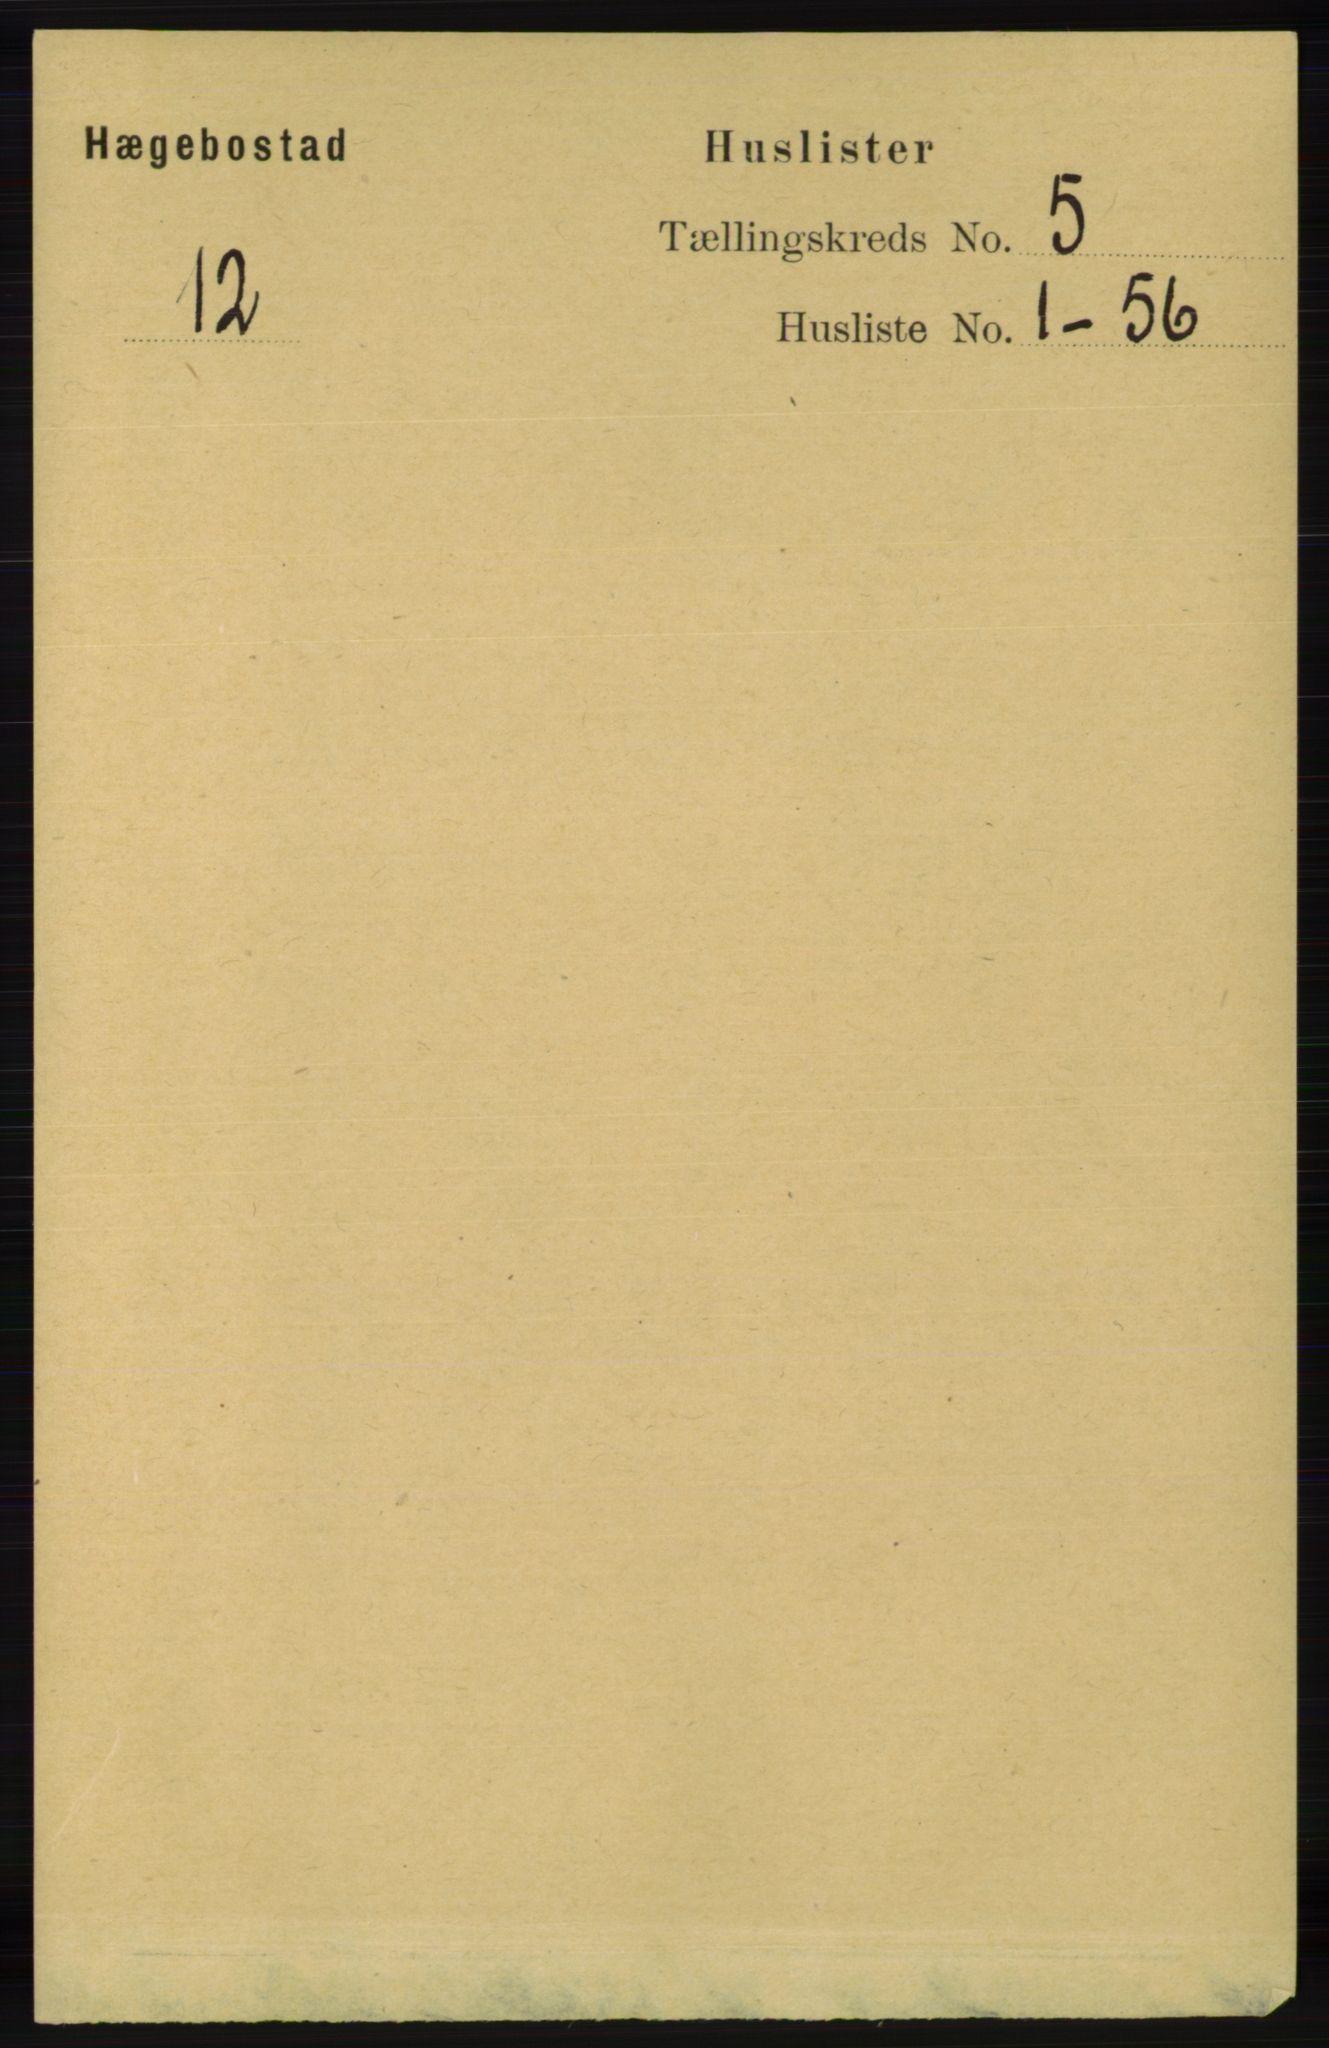 RA, Folketelling 1891 for 1034 Hægebostad herred, 1891, s. 1430